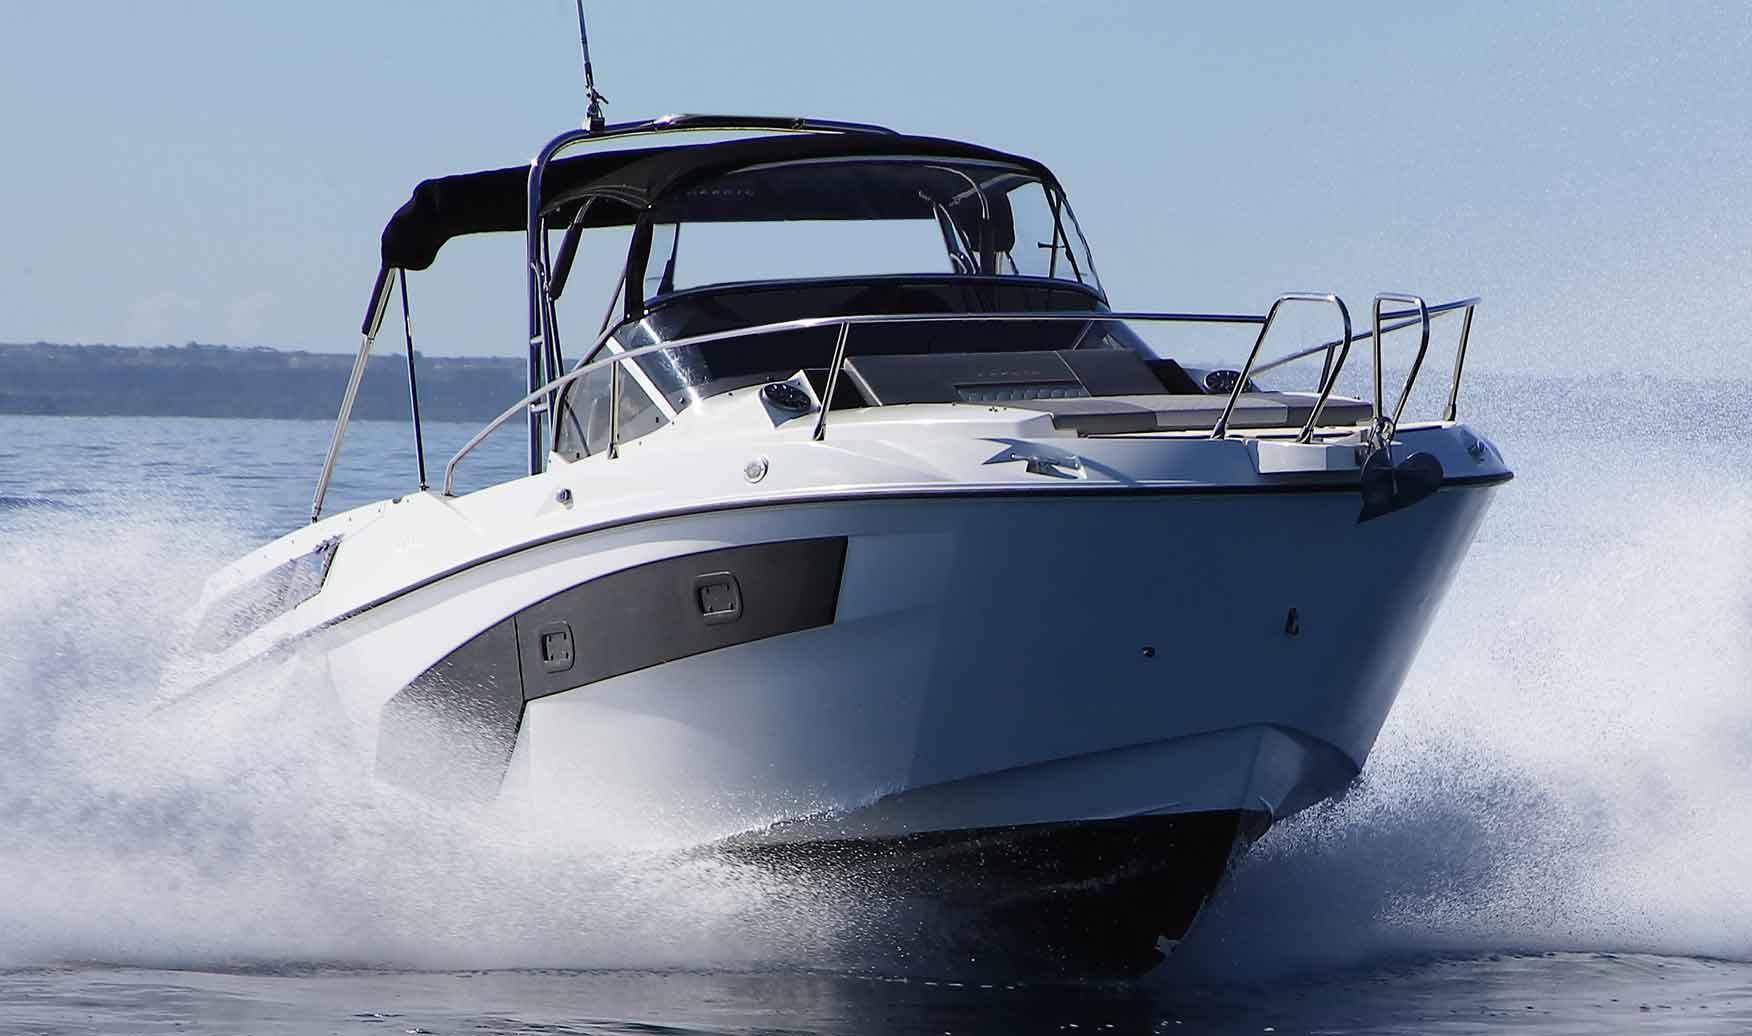 Karnic SL800 Powerboat   Latchi Charters in Cyprus